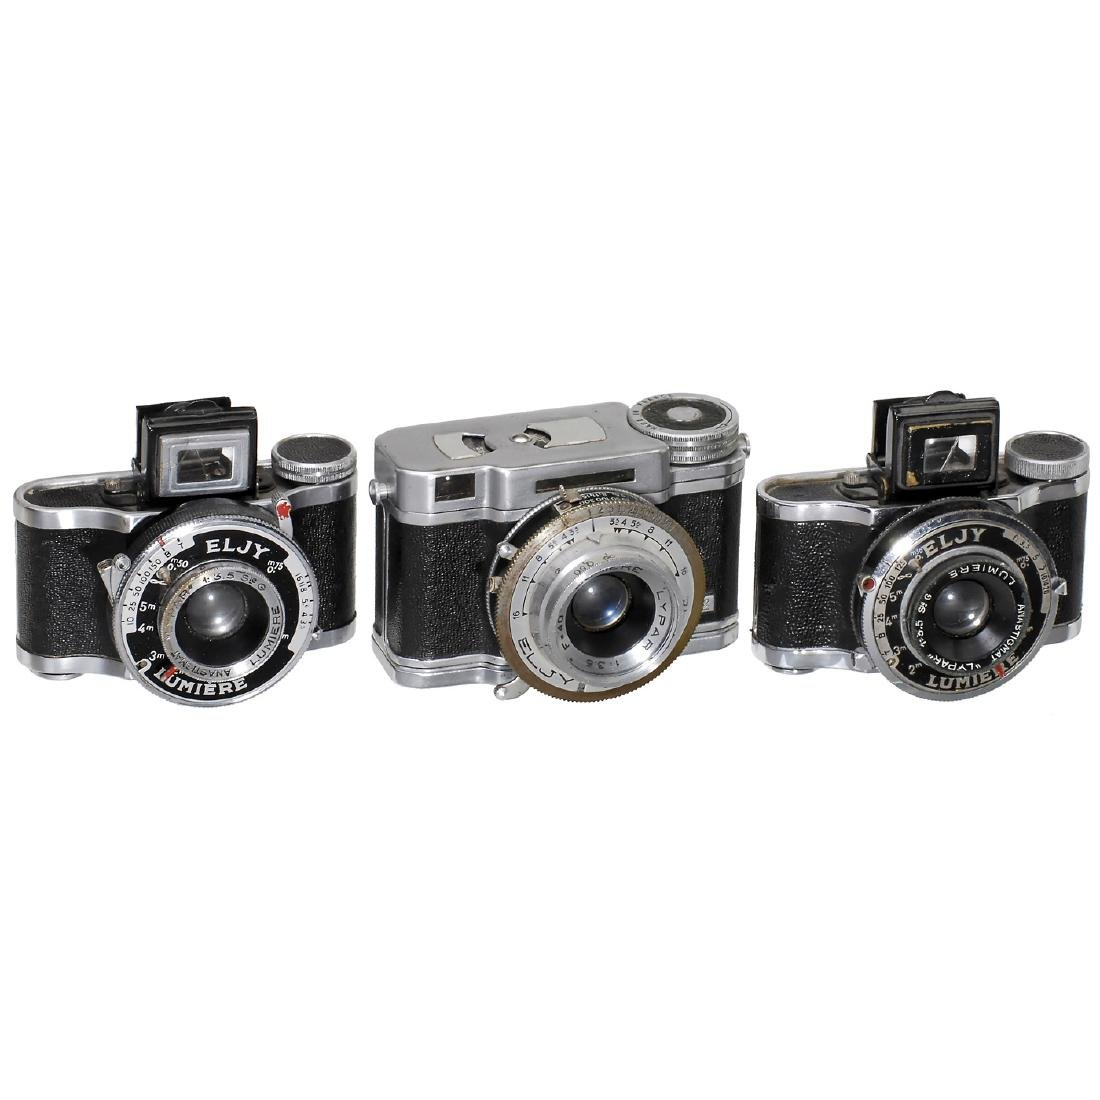 3 Eljy Cameras